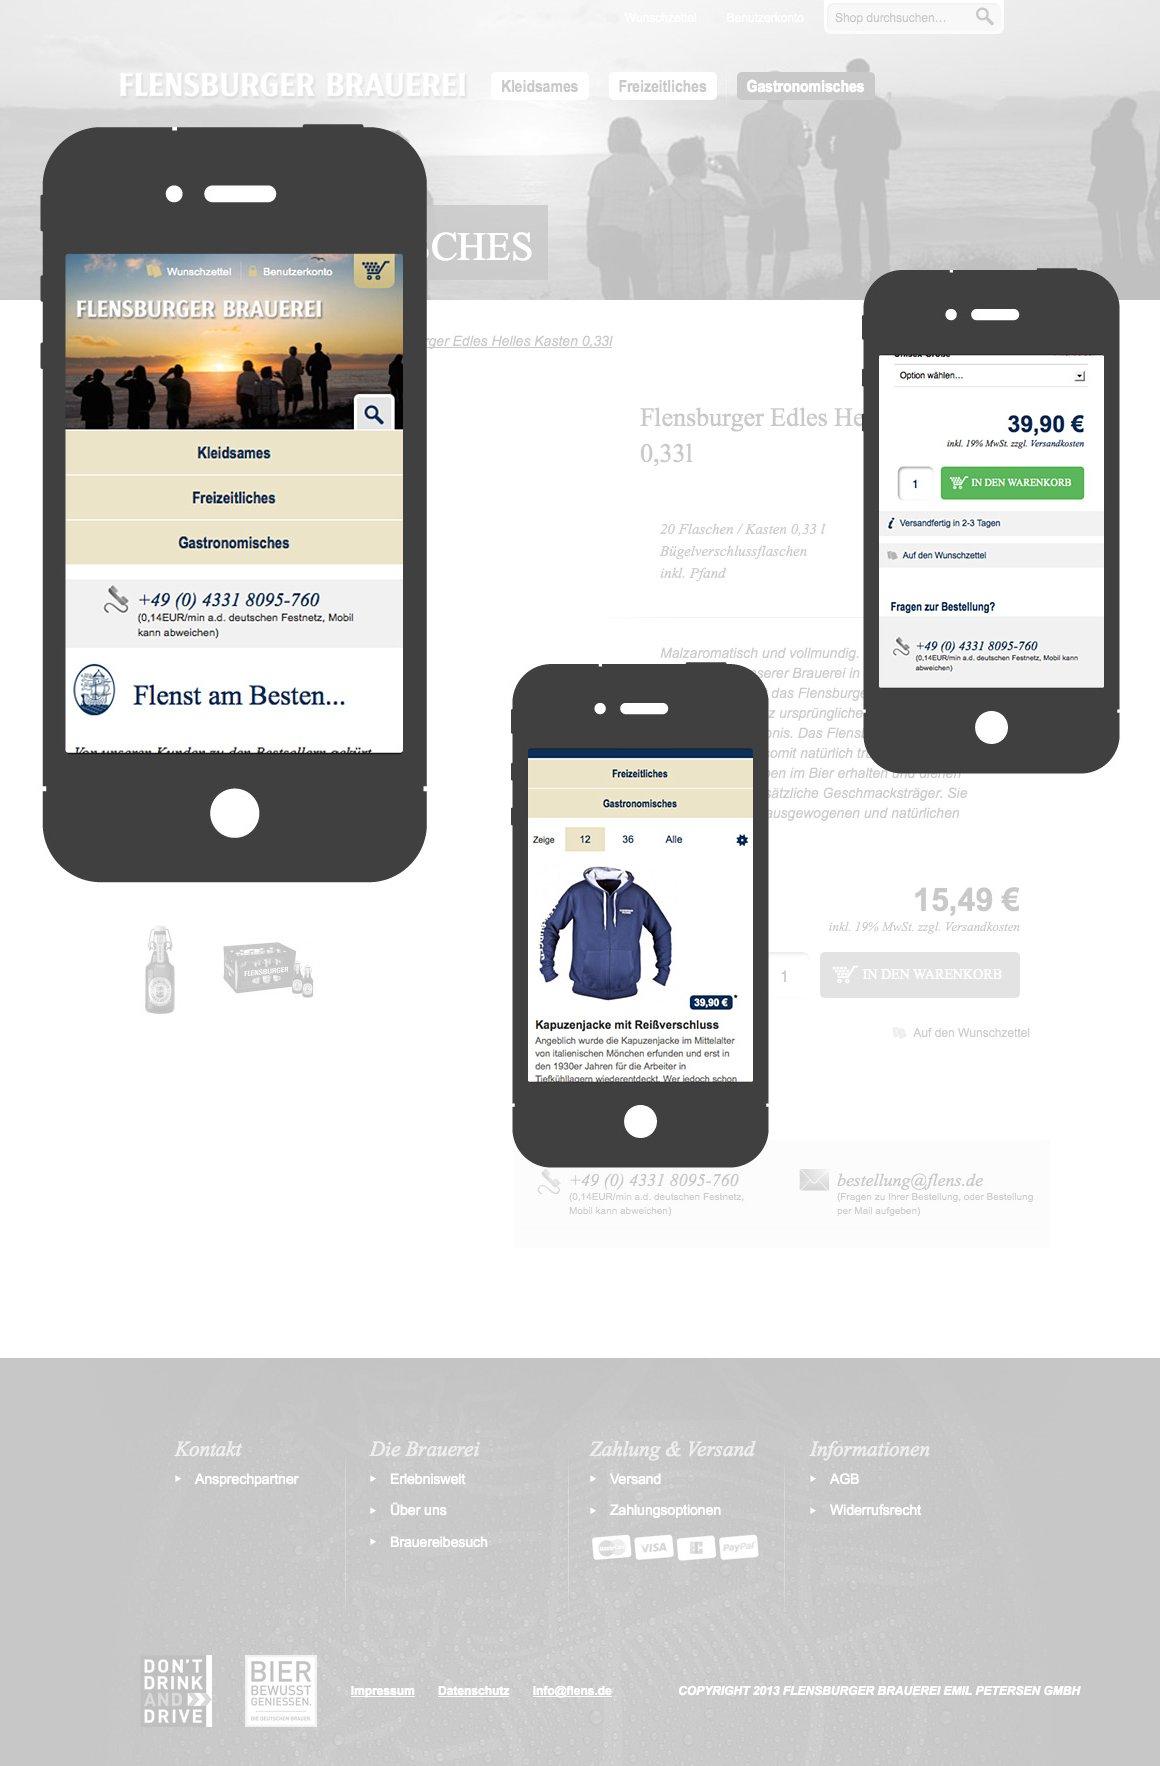 Flensburger Brauerei - Responsives Layout am Smartphone